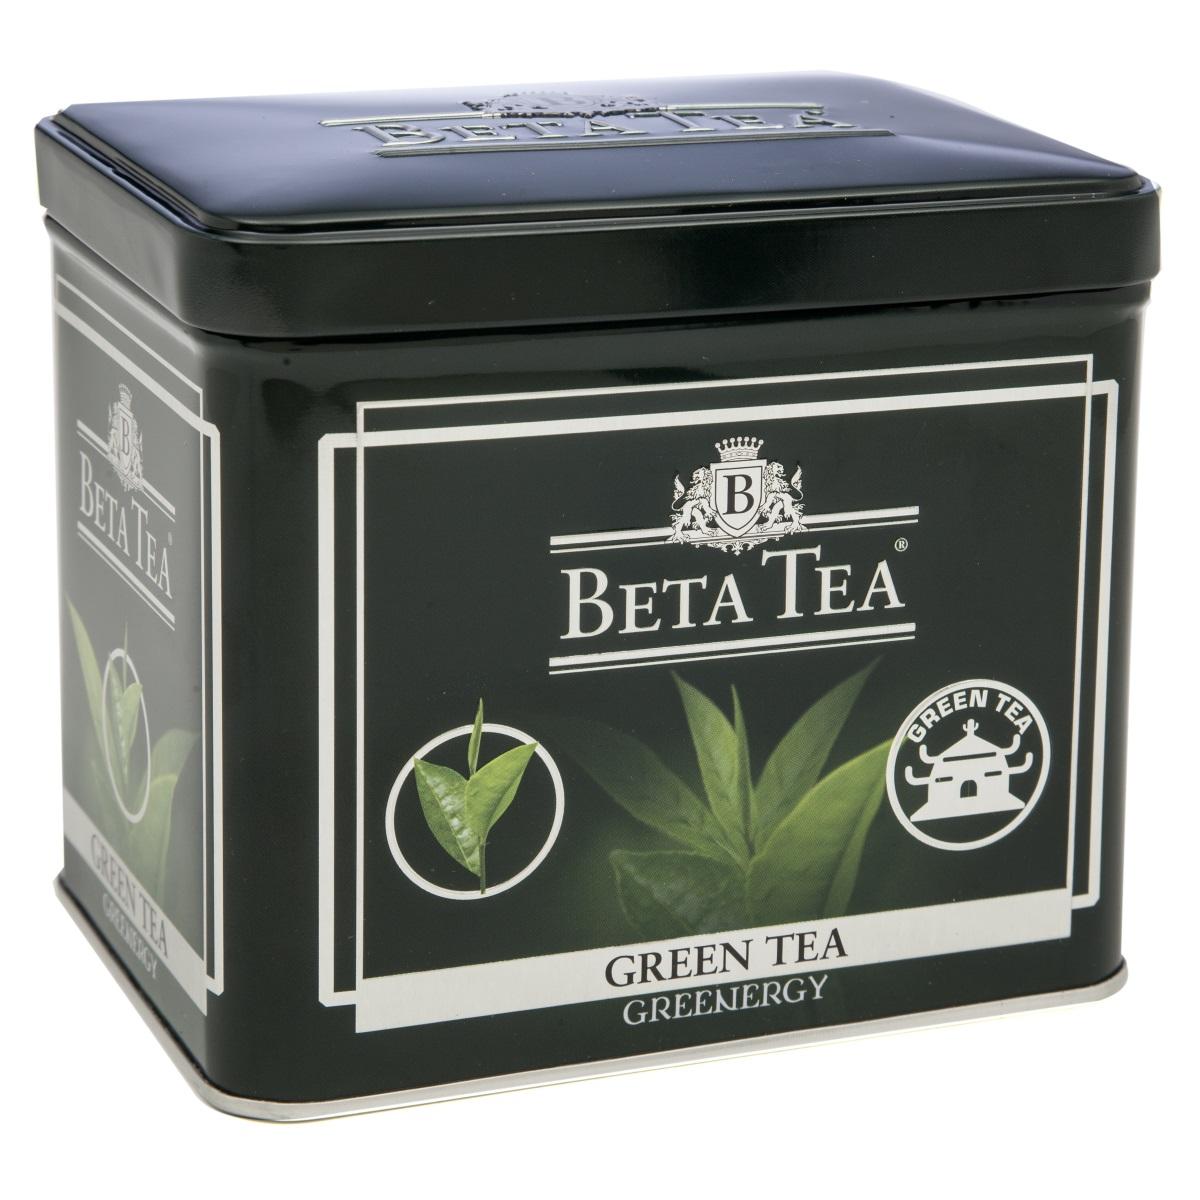 Beta Tea зеленый листовой чай, 250 г (жестяная банка) beta tea super tea черный листовой чай с бергамотом 100 г